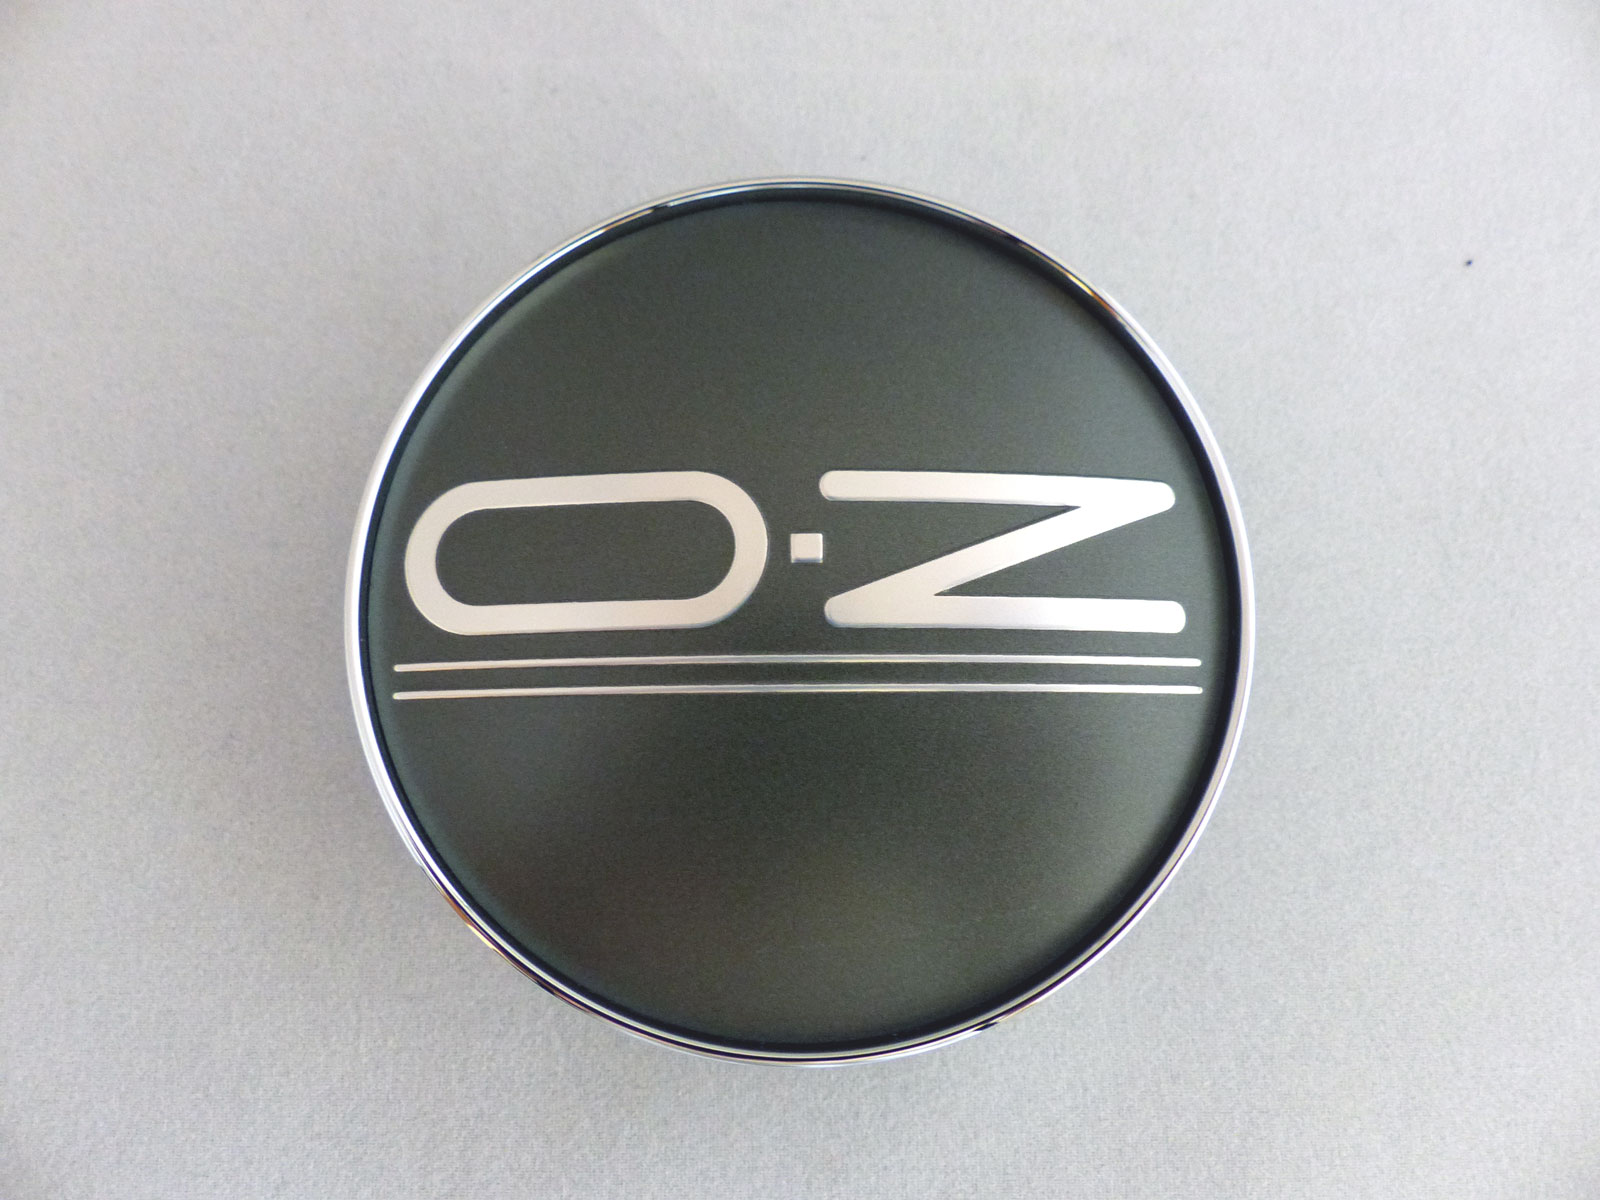 1x OZ Nabendeckel Nabenkappe M669 grau matt 76,3 mm Monaco Montecarlo HLT